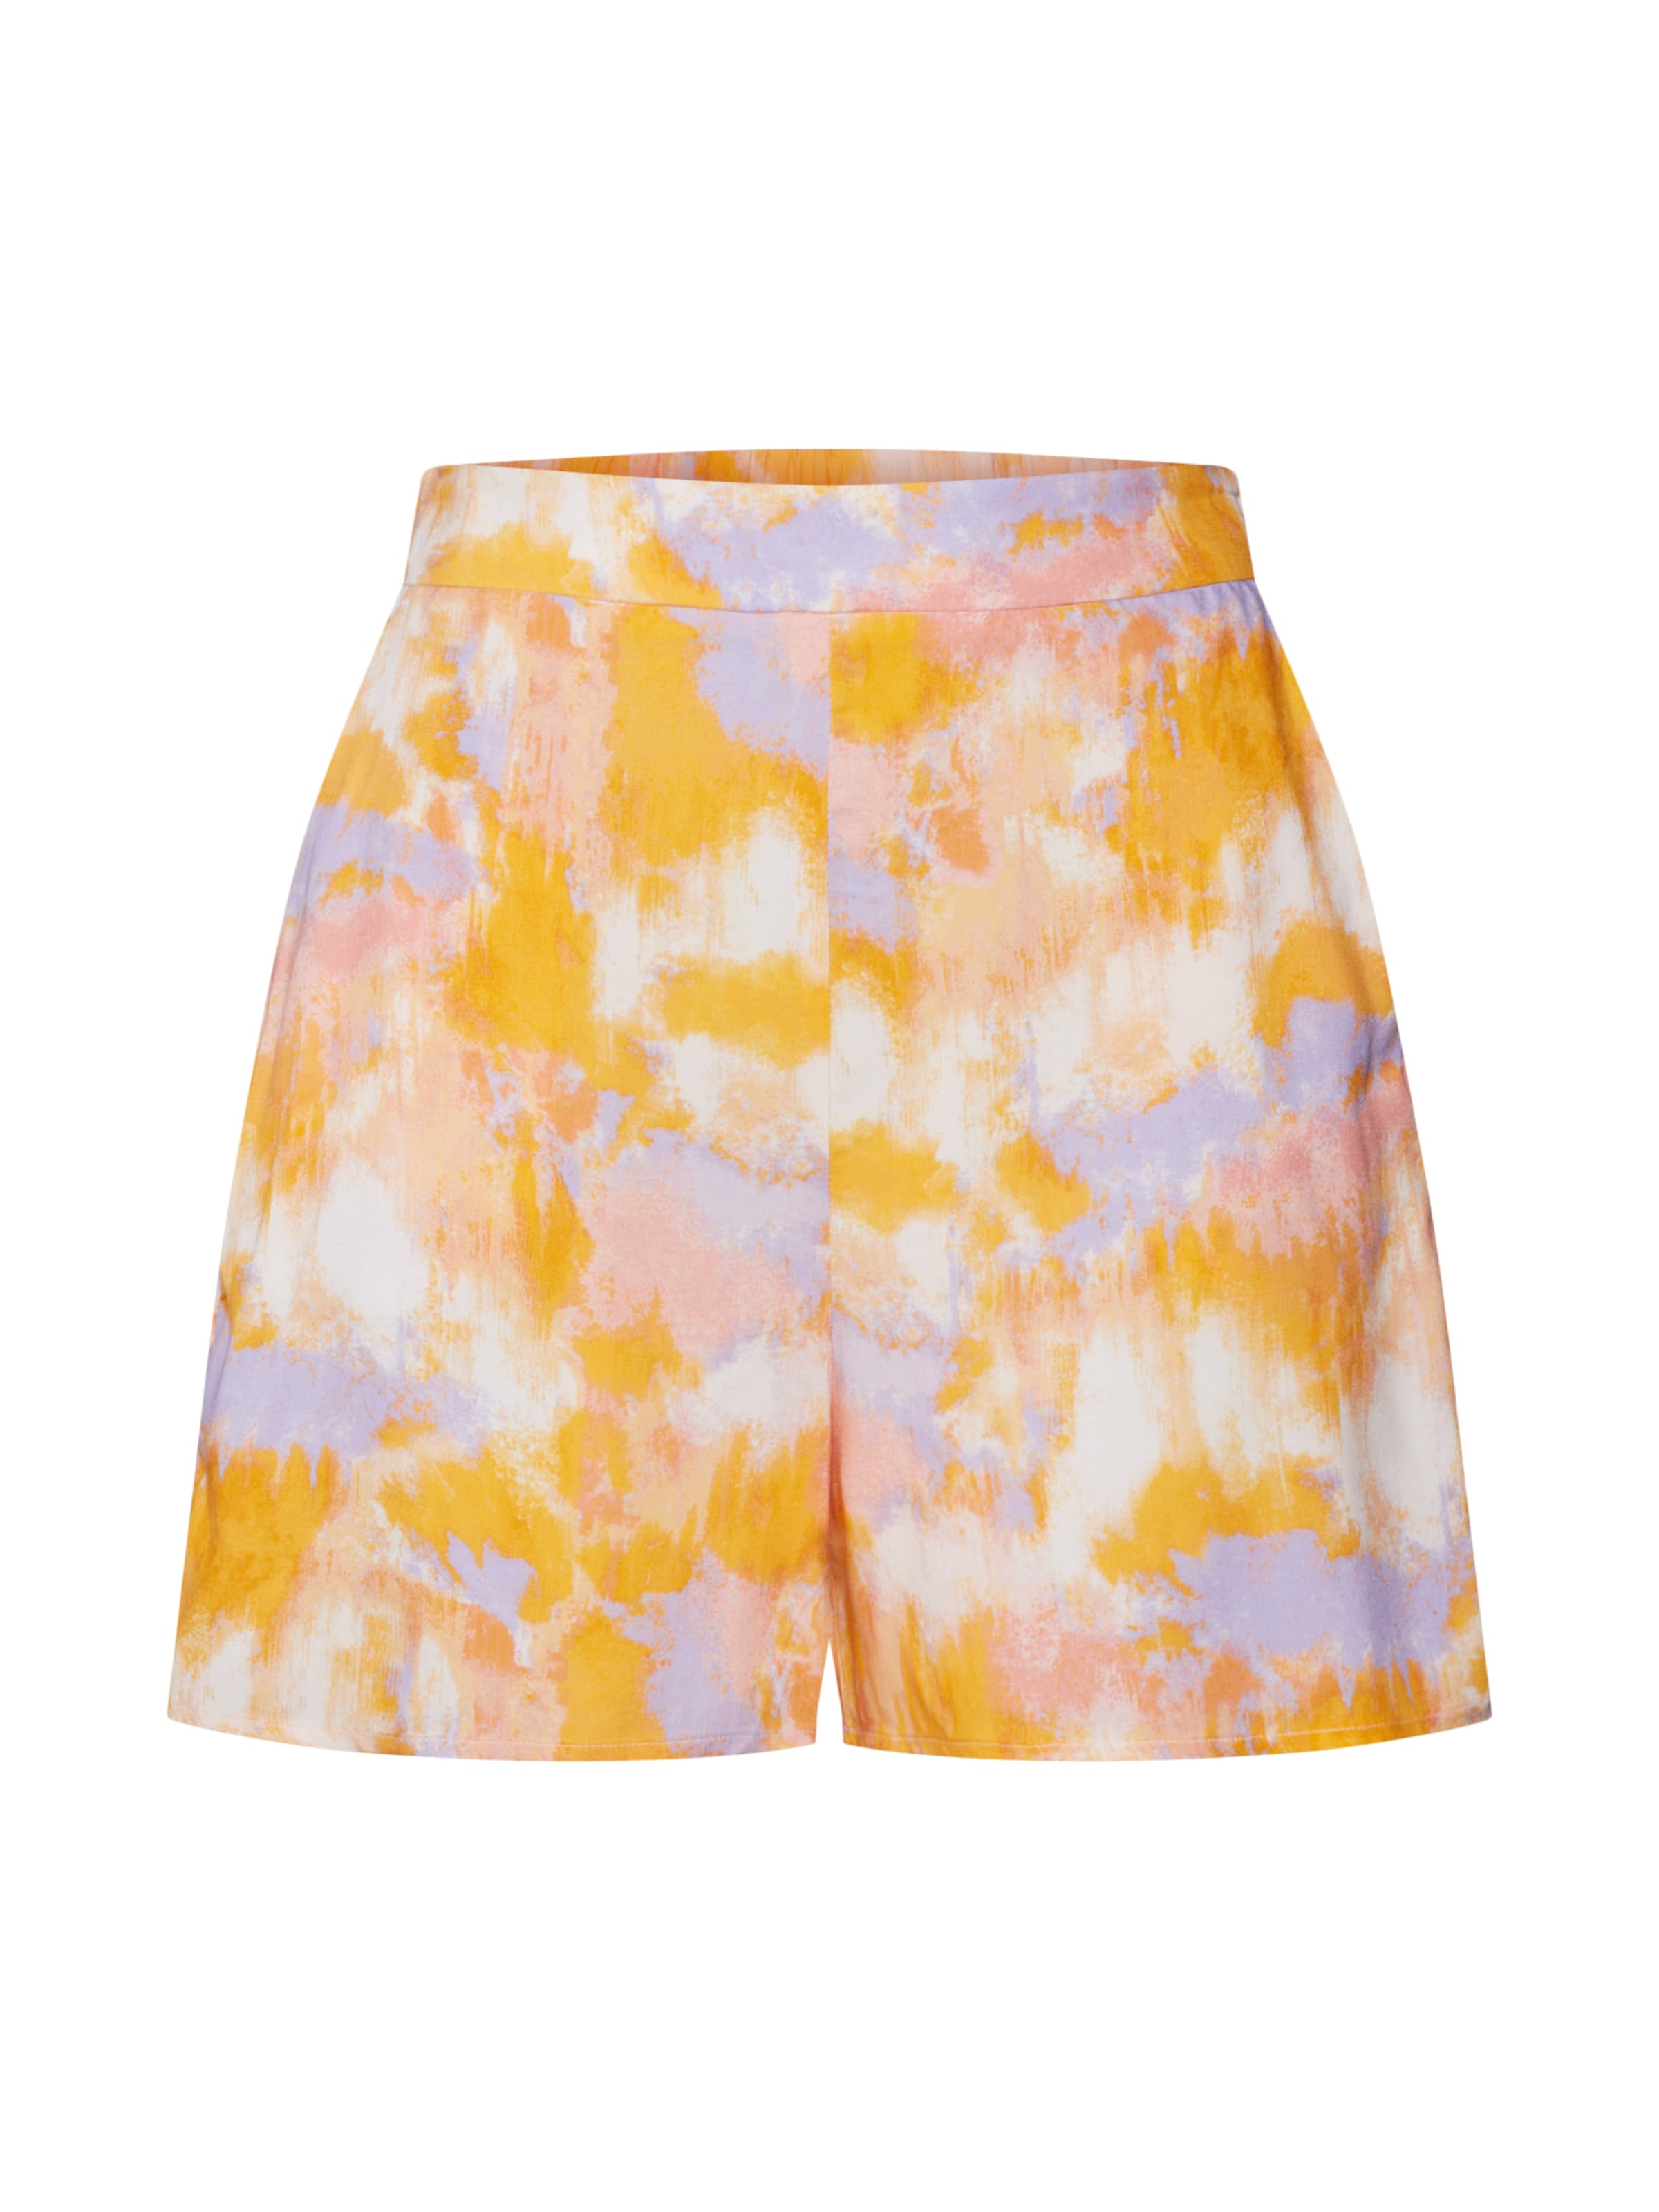 New 'lola Orange Look Short' Tie Hosen Dye In Flippy CremeHellblau 5R34jqLcAS